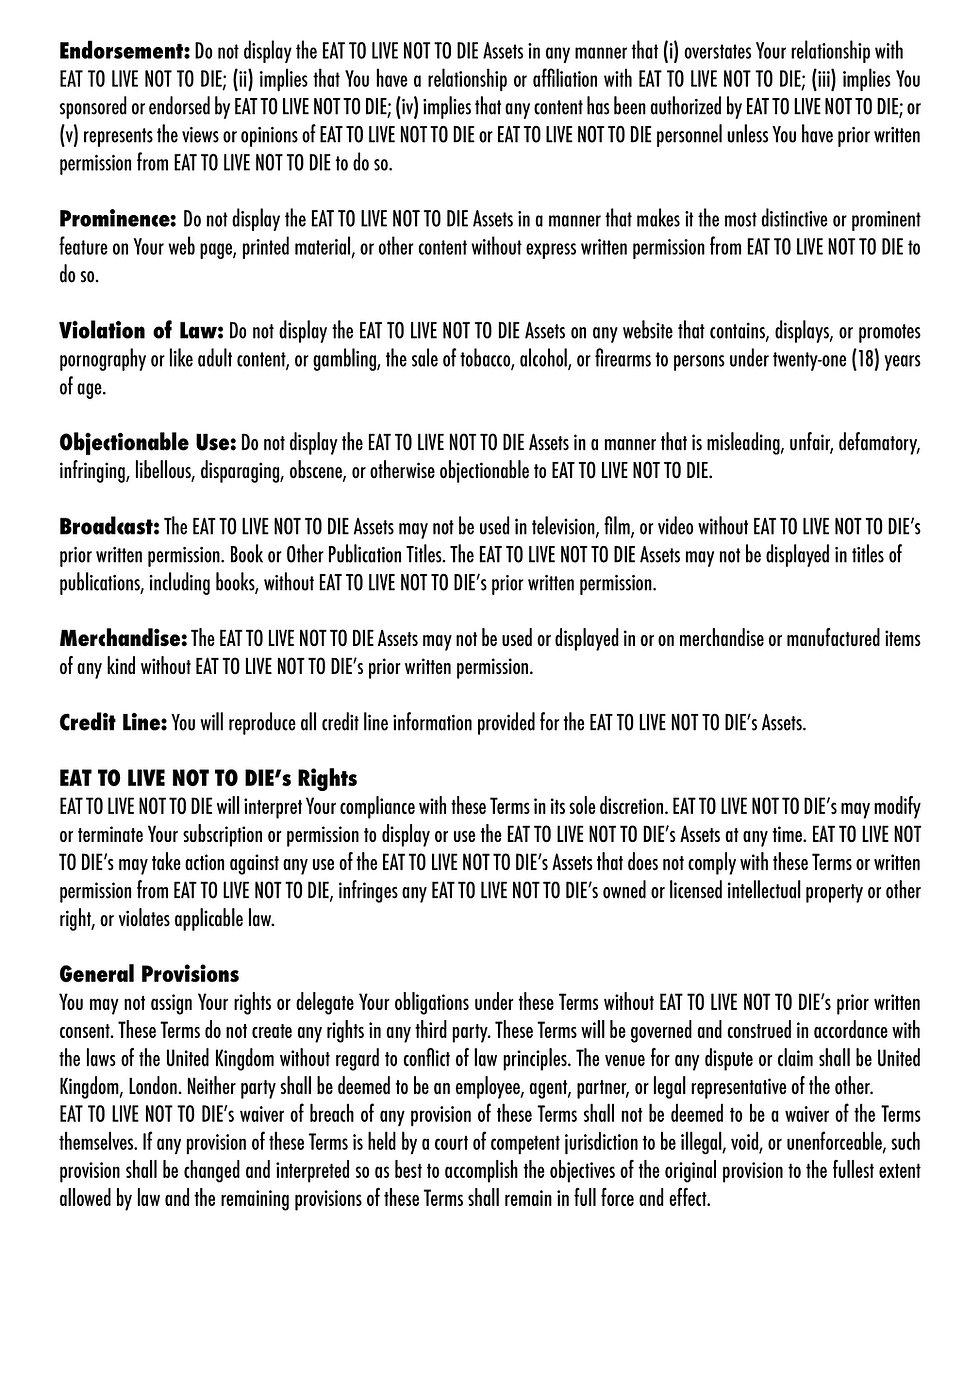 ETLNTD Terms & Condtion3.jpg